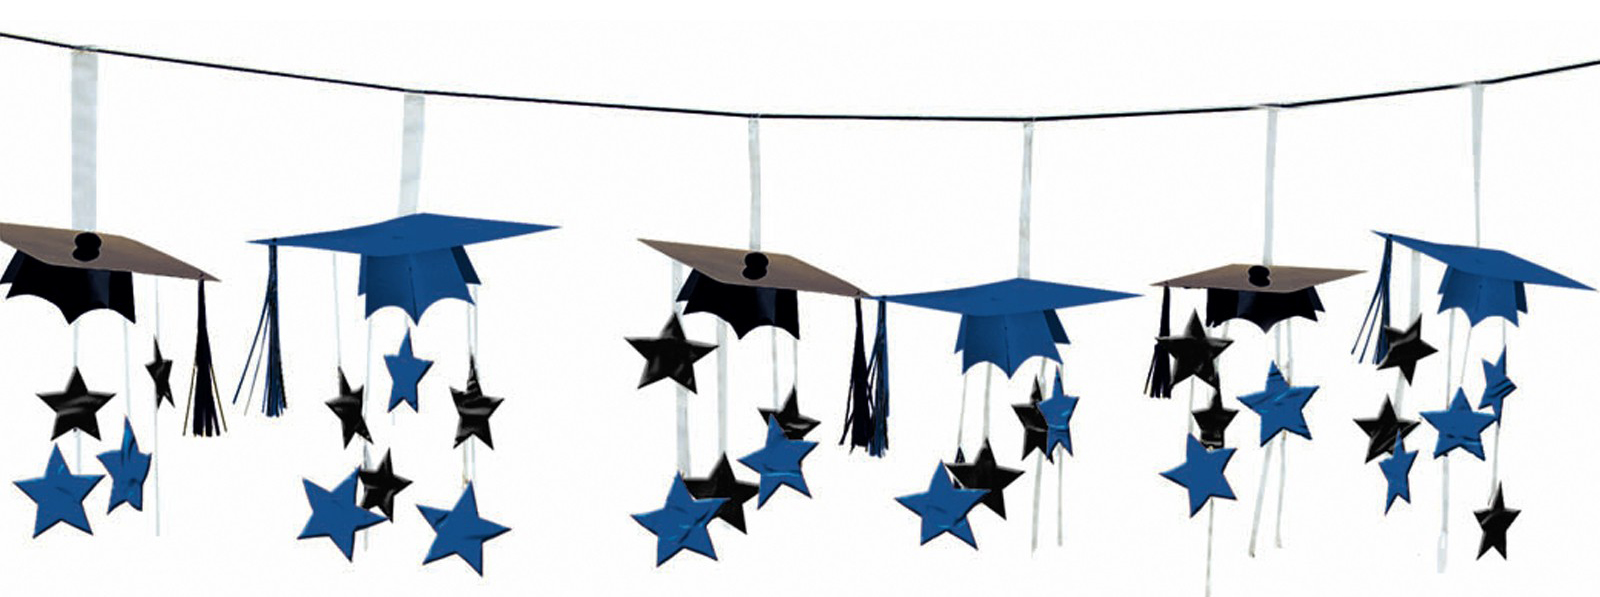 1600x597 Graduation Information